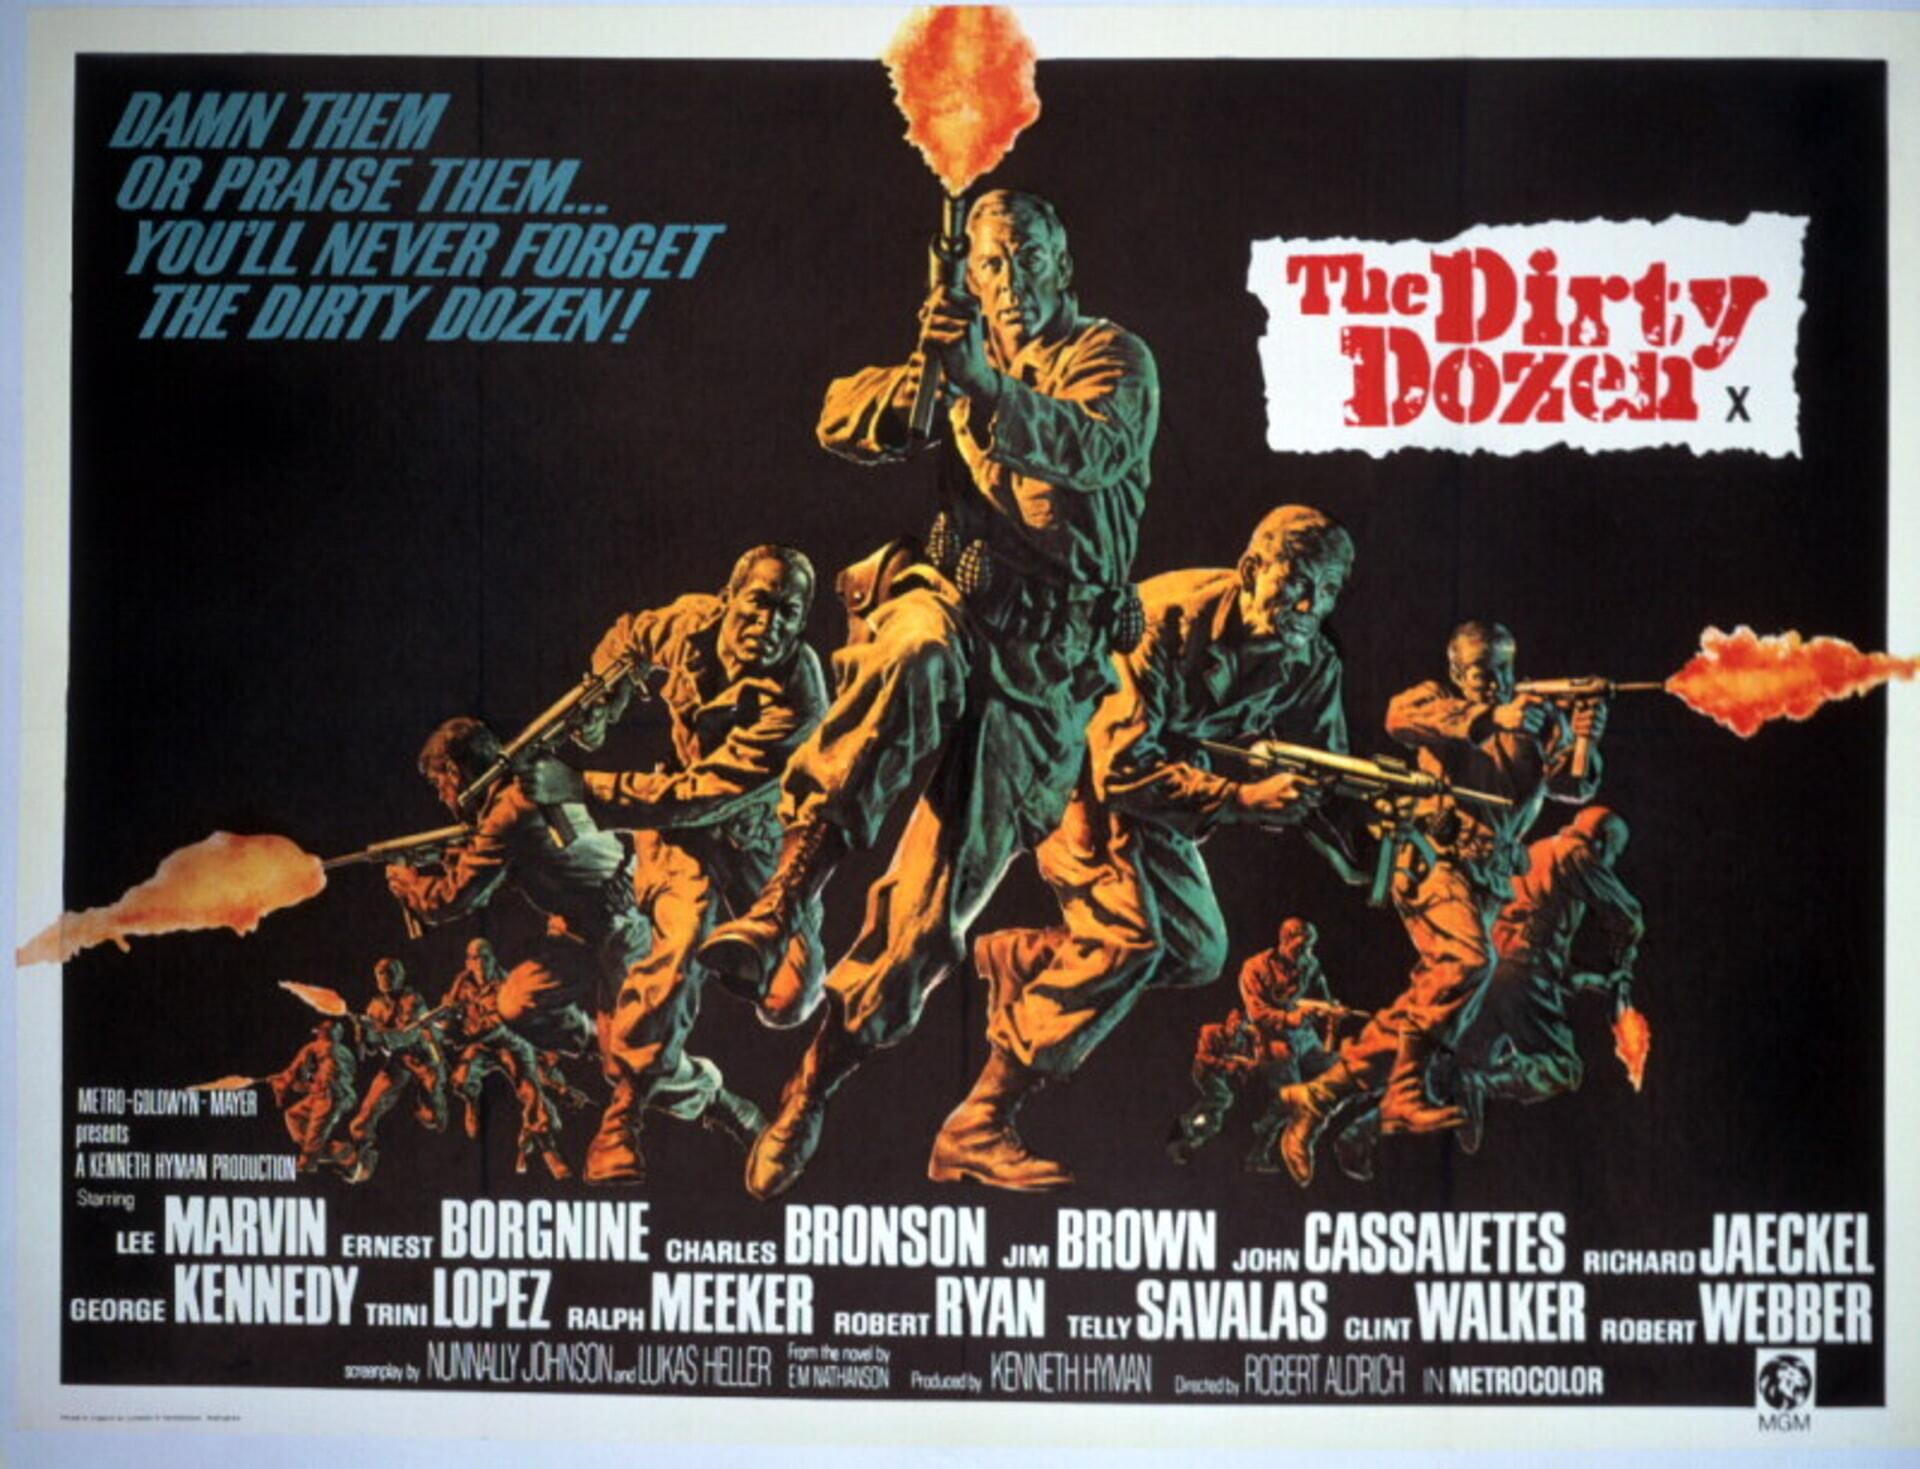 The Dirty Dozen - Poster 3